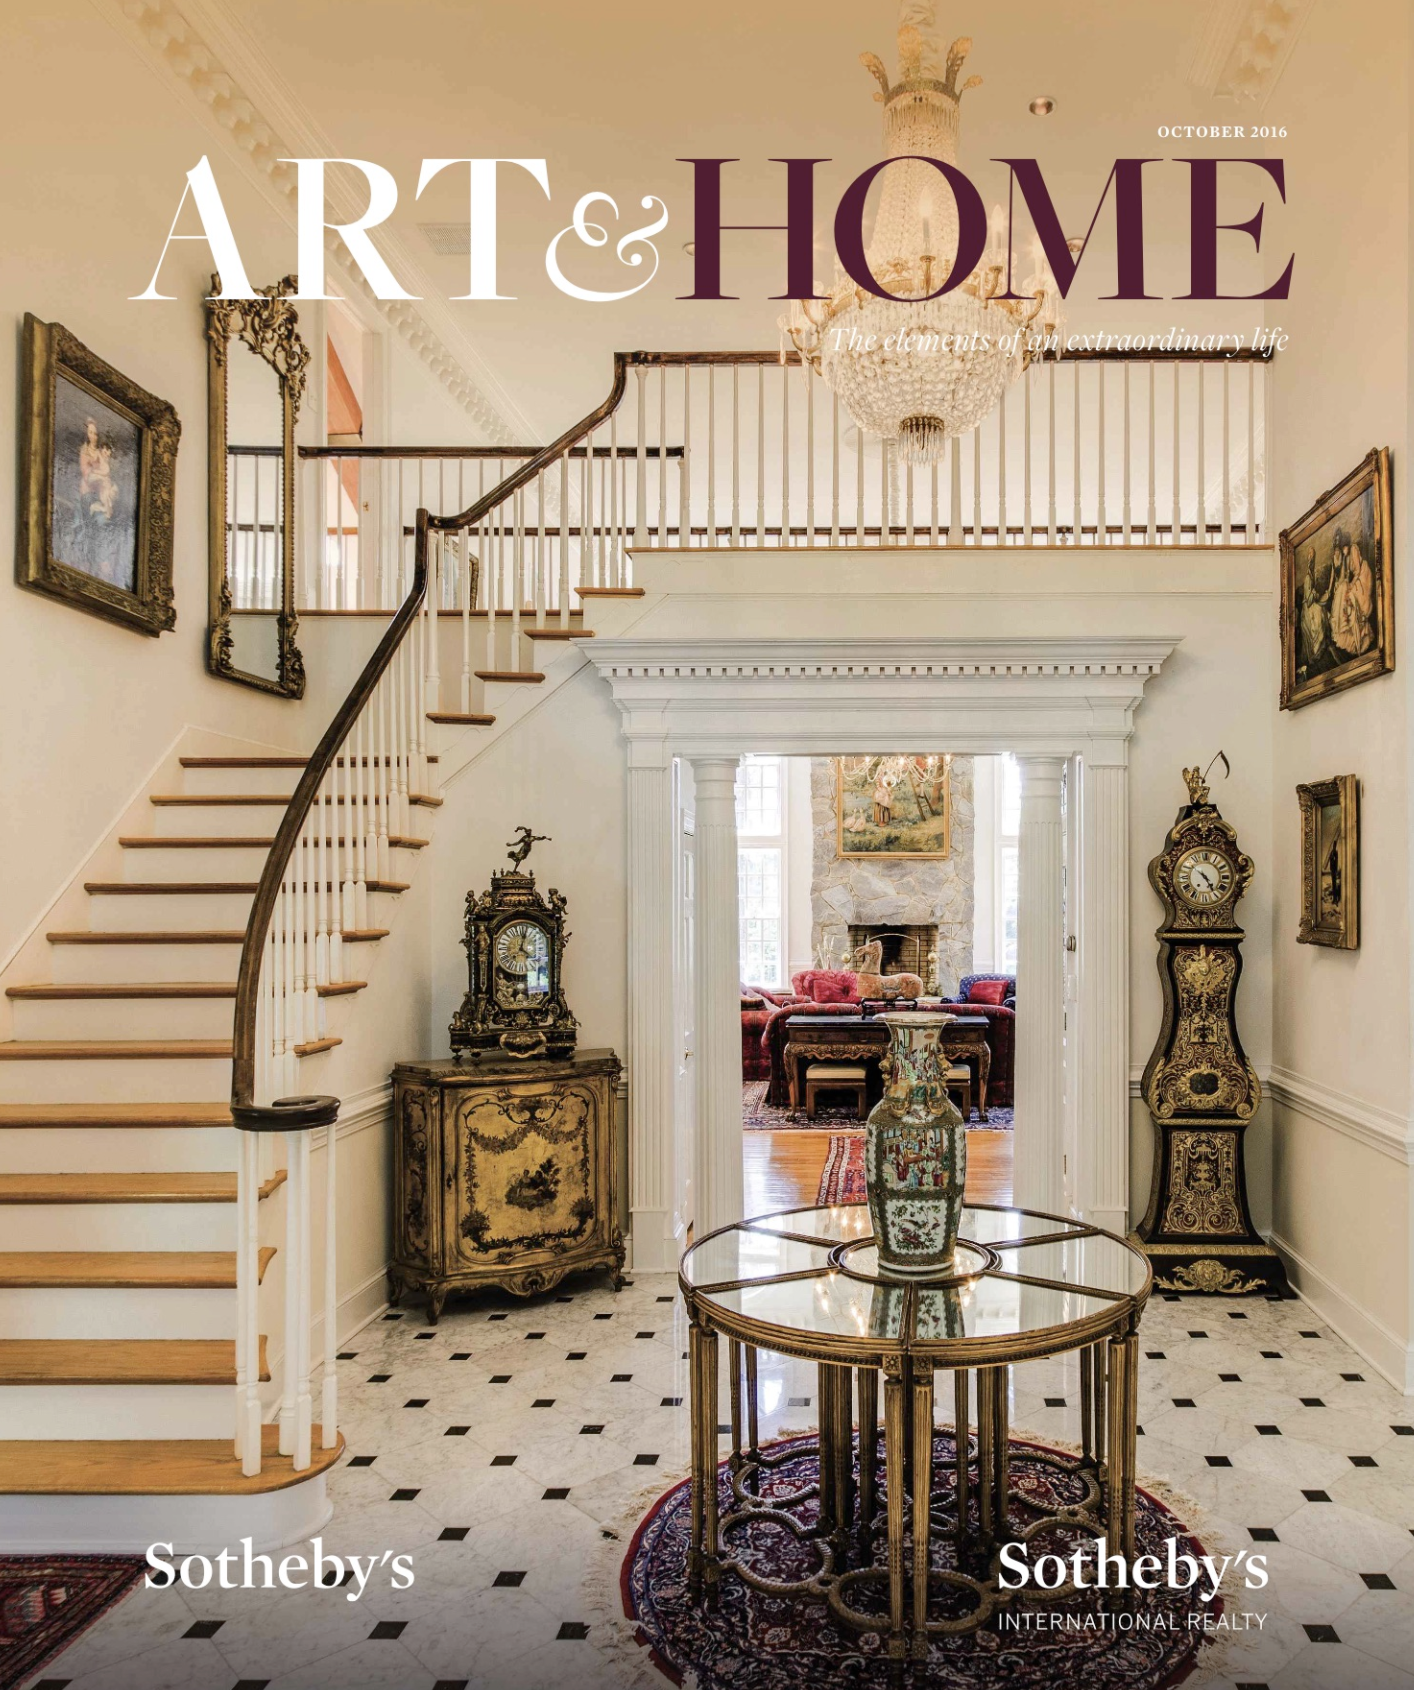 Sotheby's Art & Home Magazine